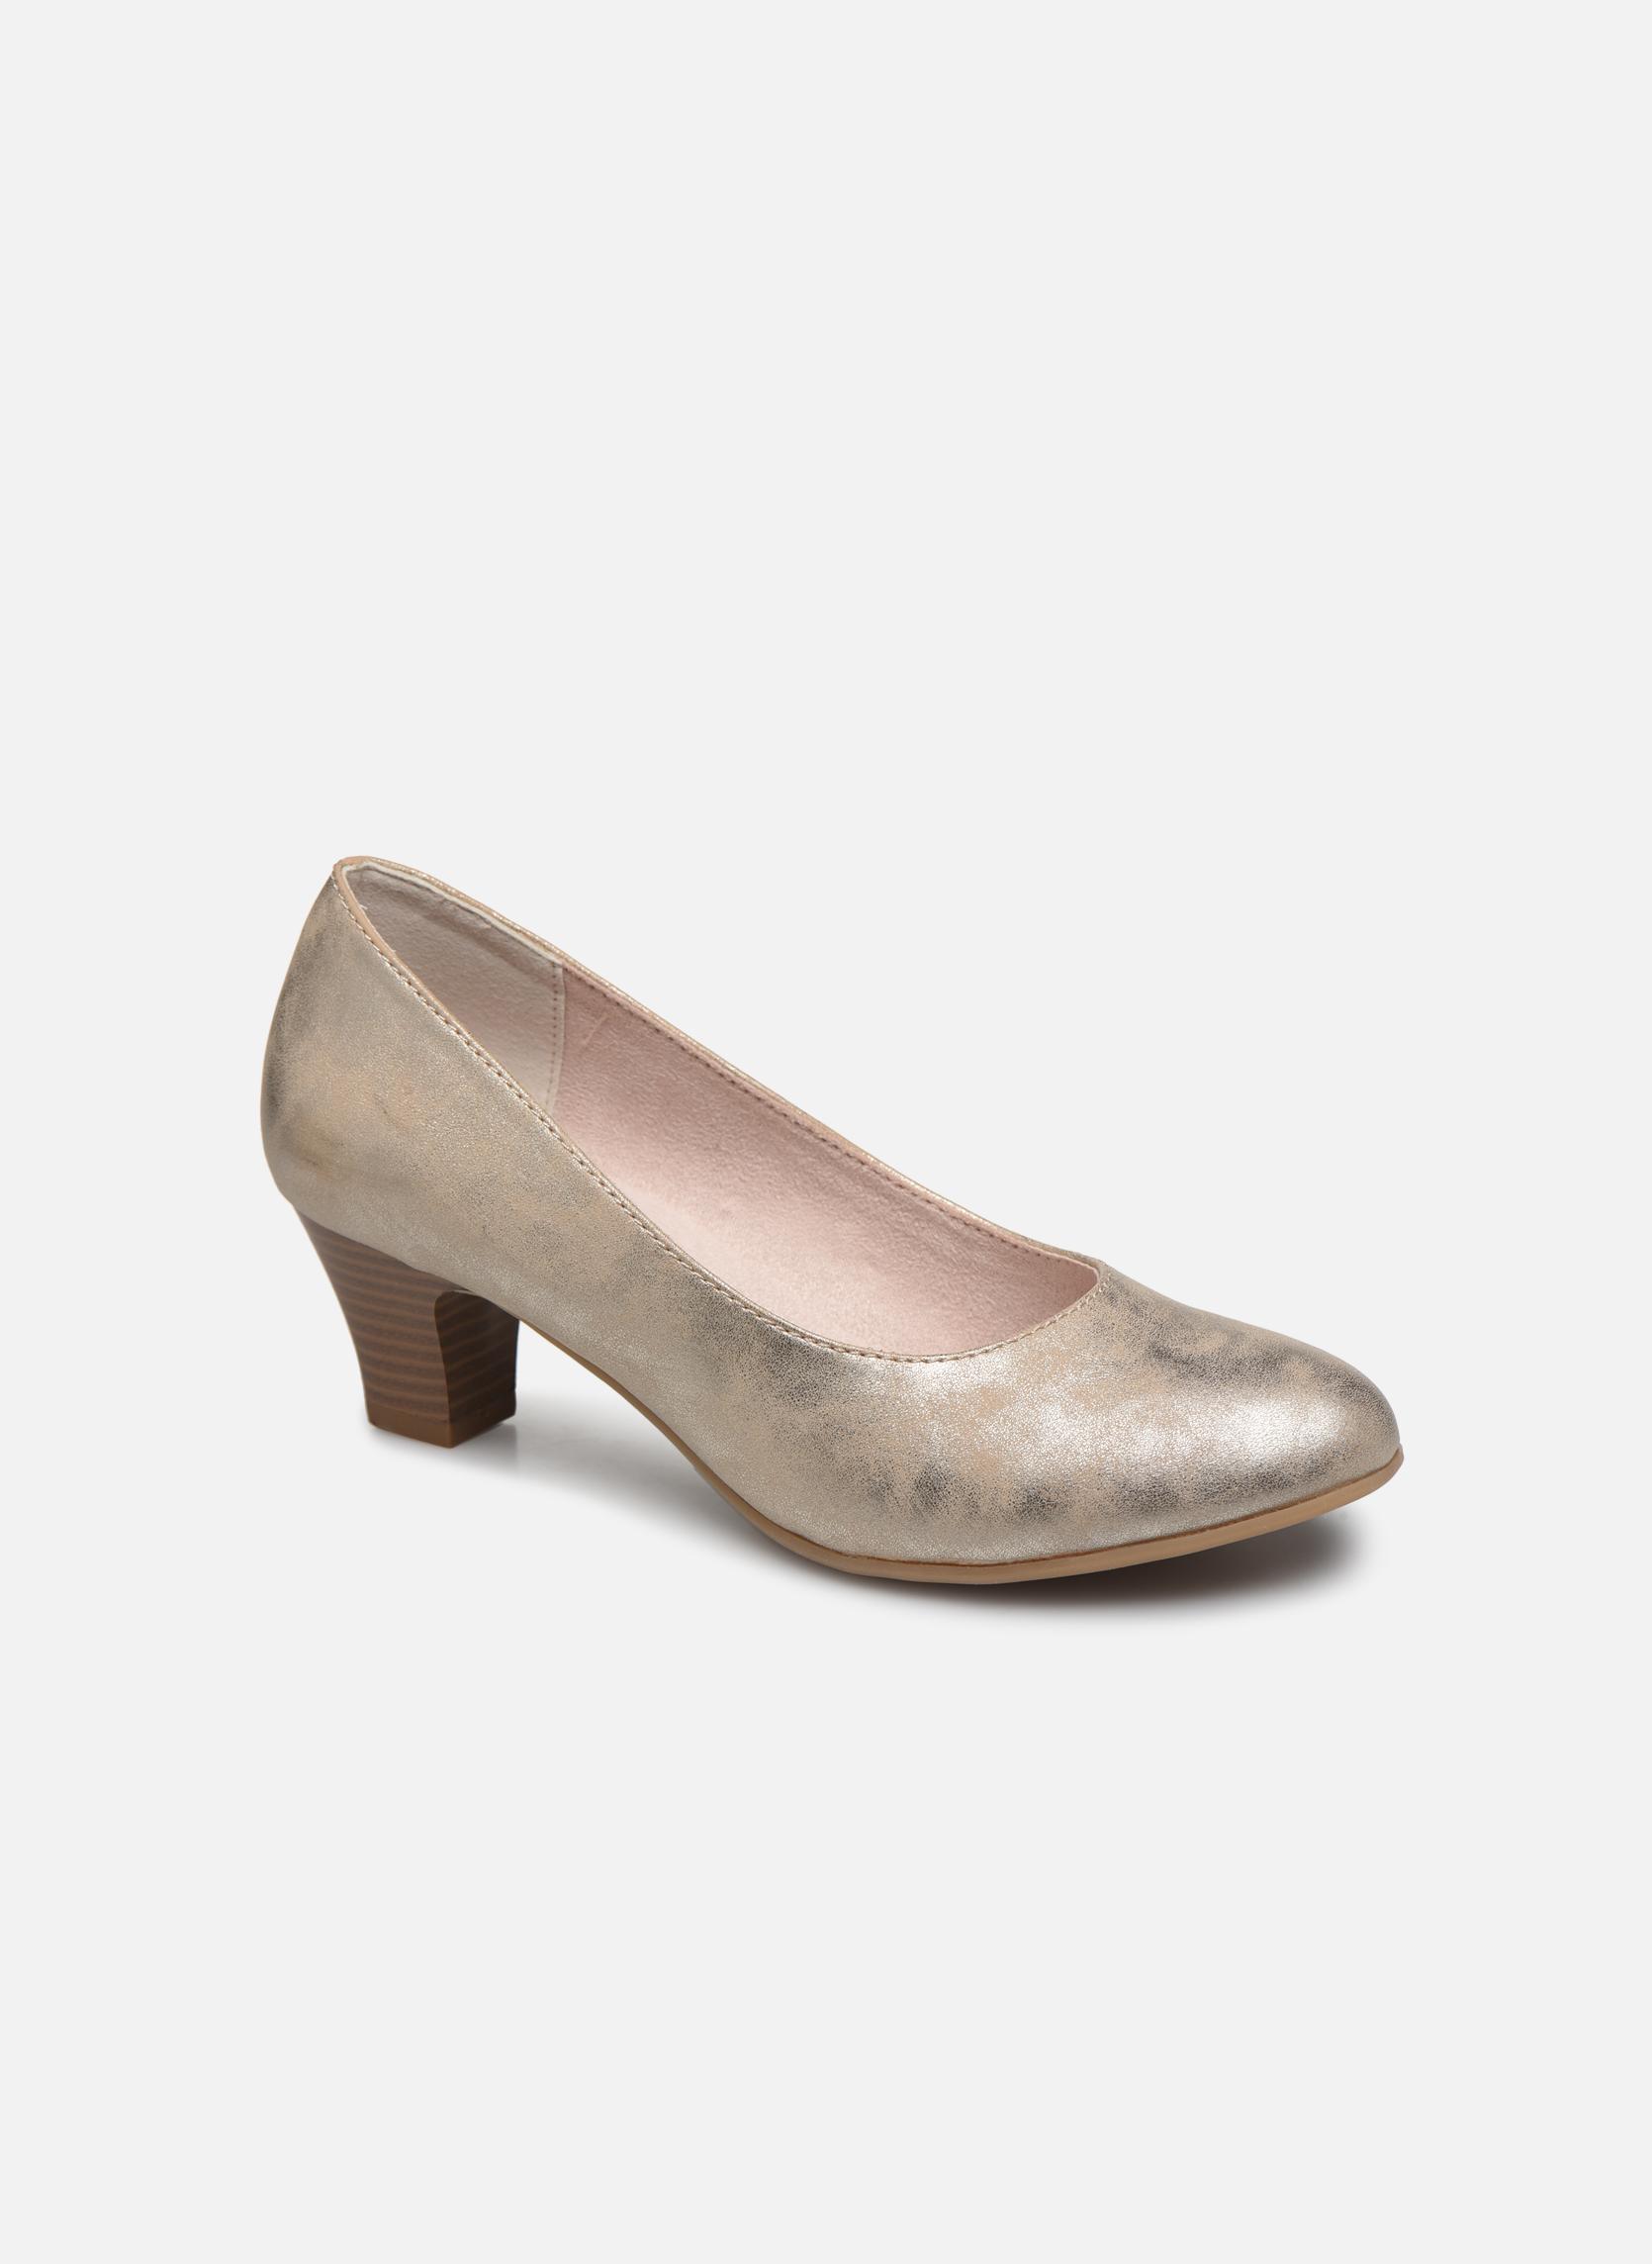 Zapatos de tacón Mujer Anis